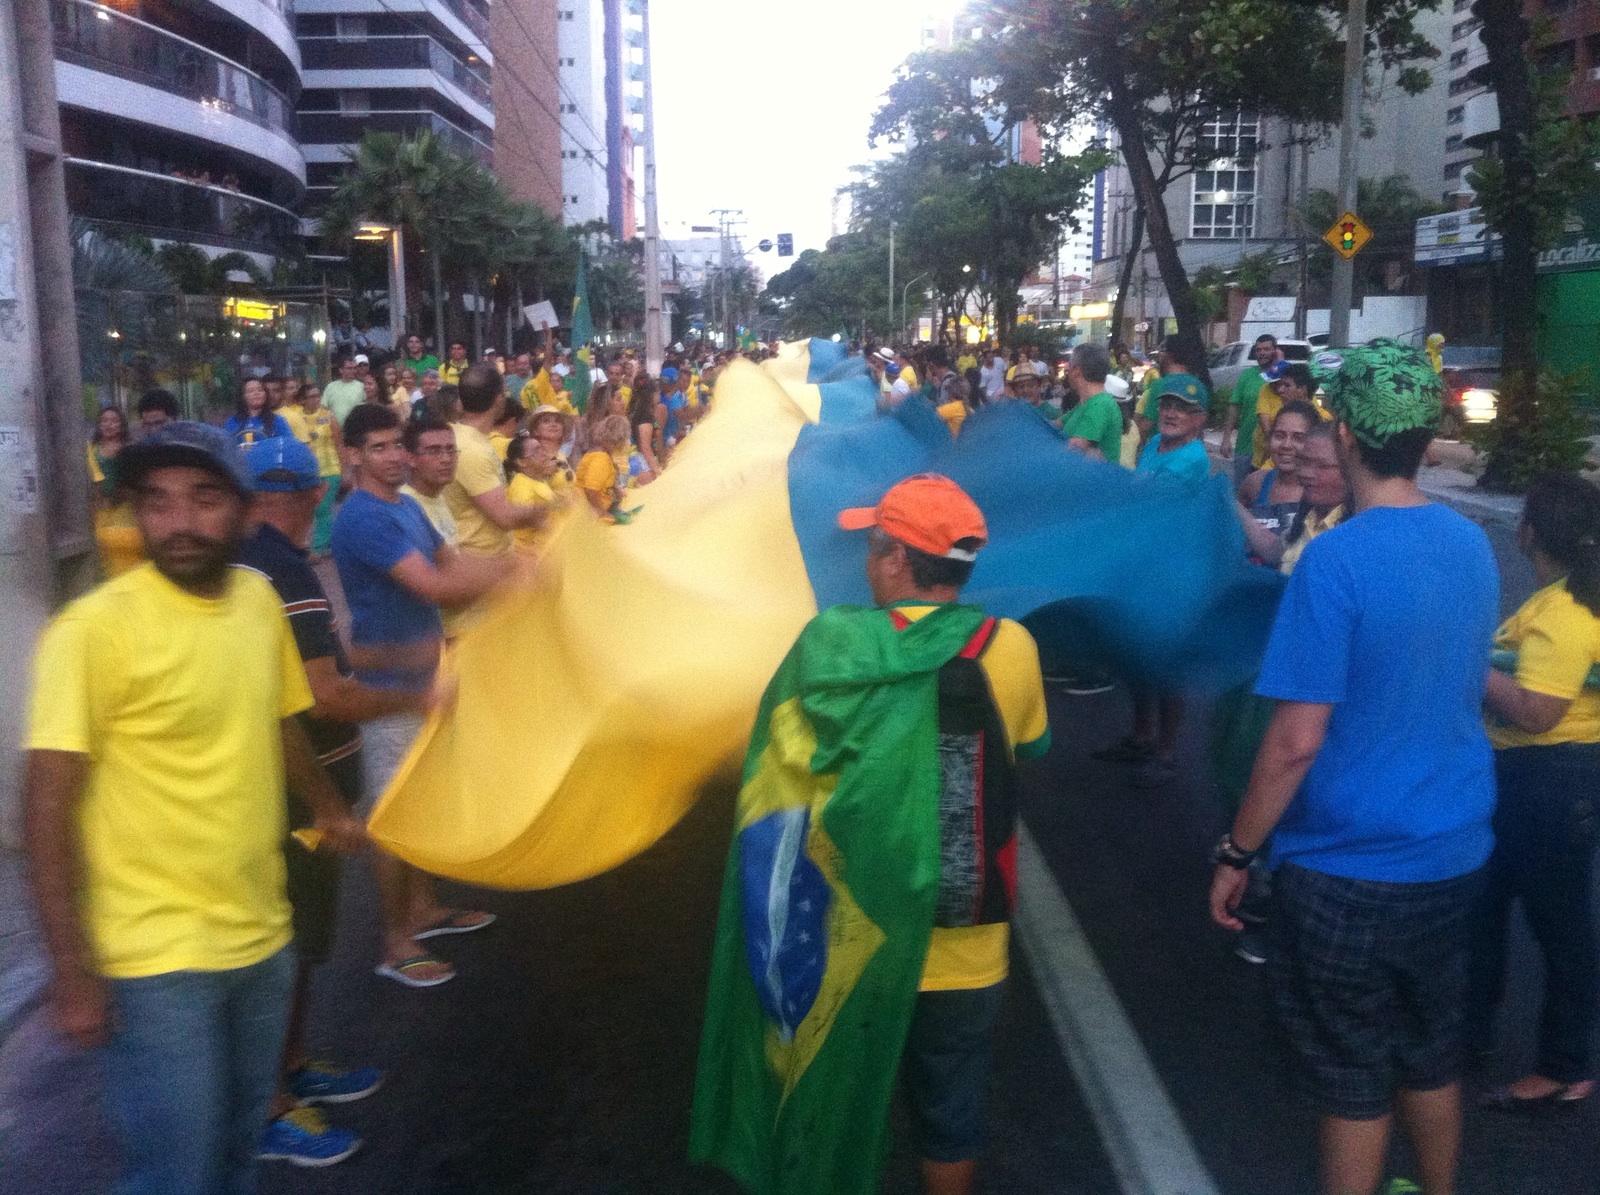 Foto: Lyvia Rocha/Tribuna do Ceará